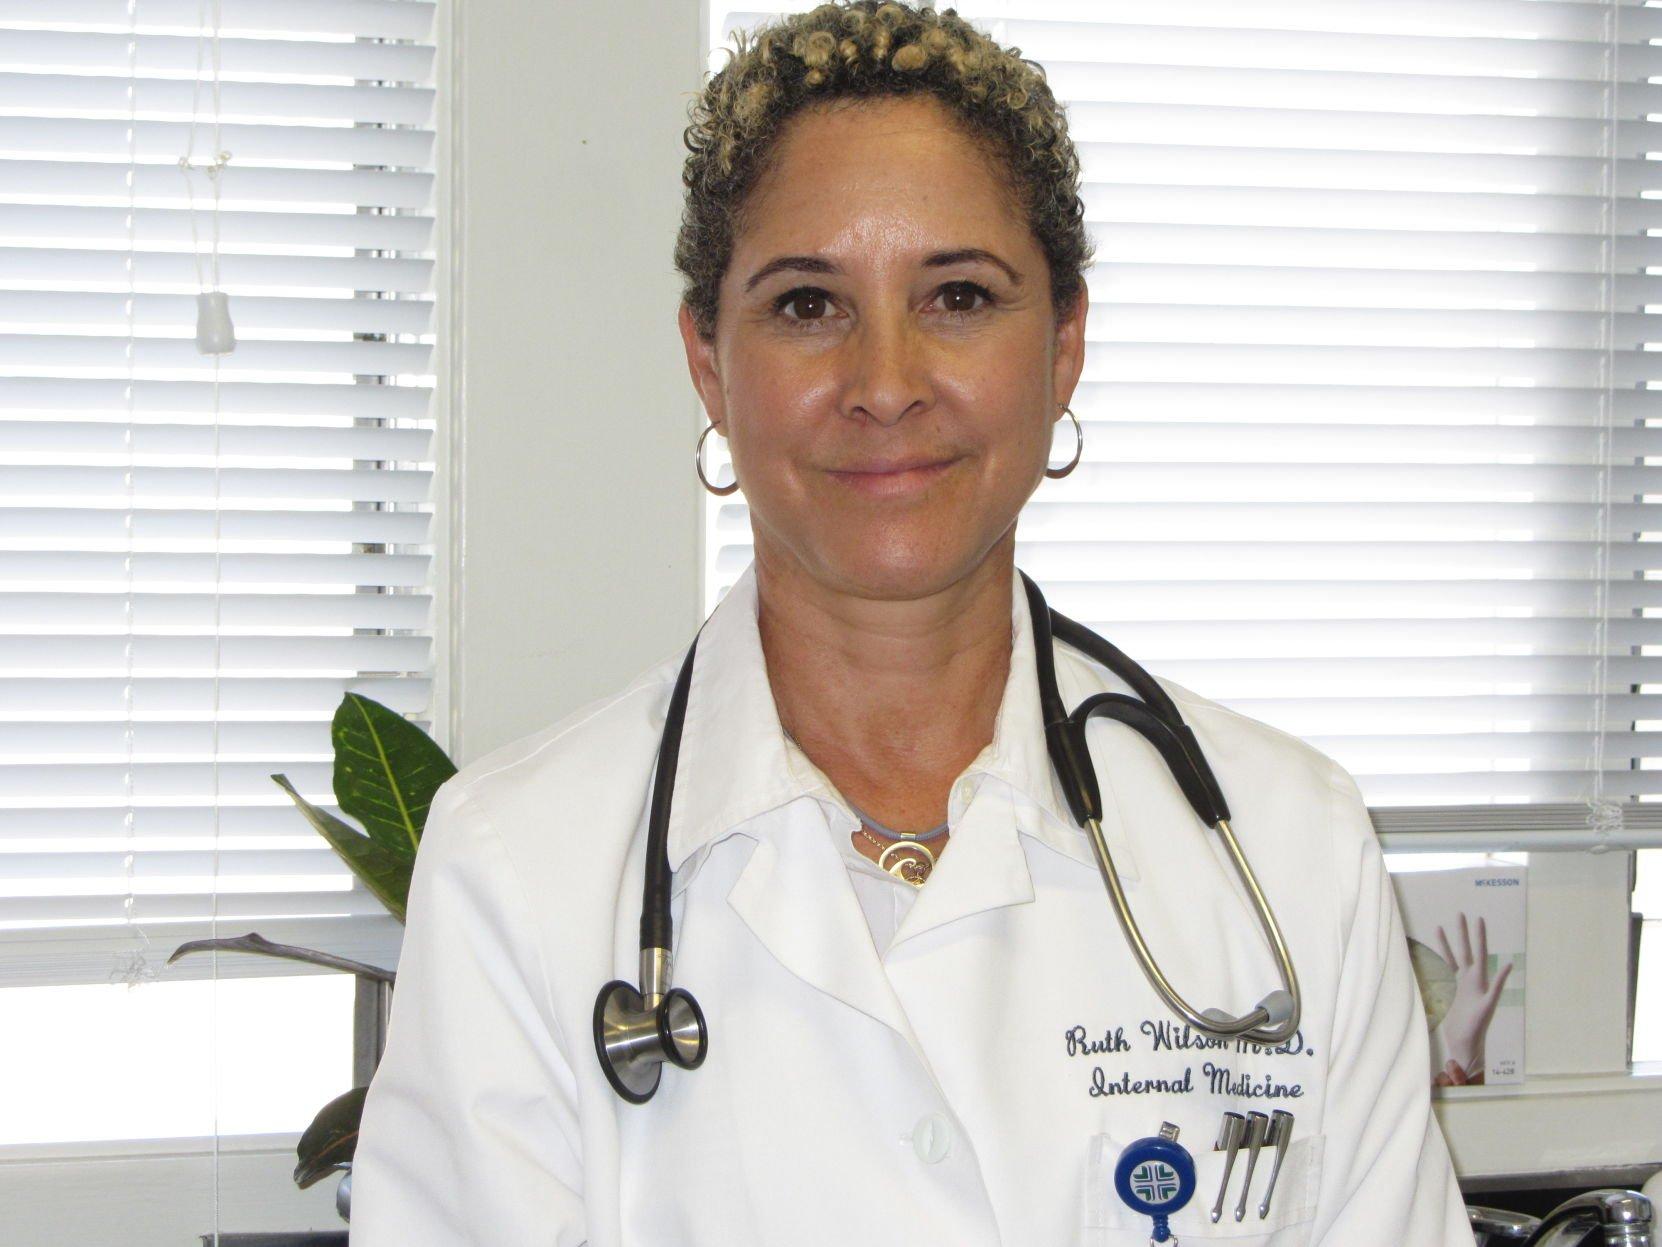 Ruth Wilson, MD